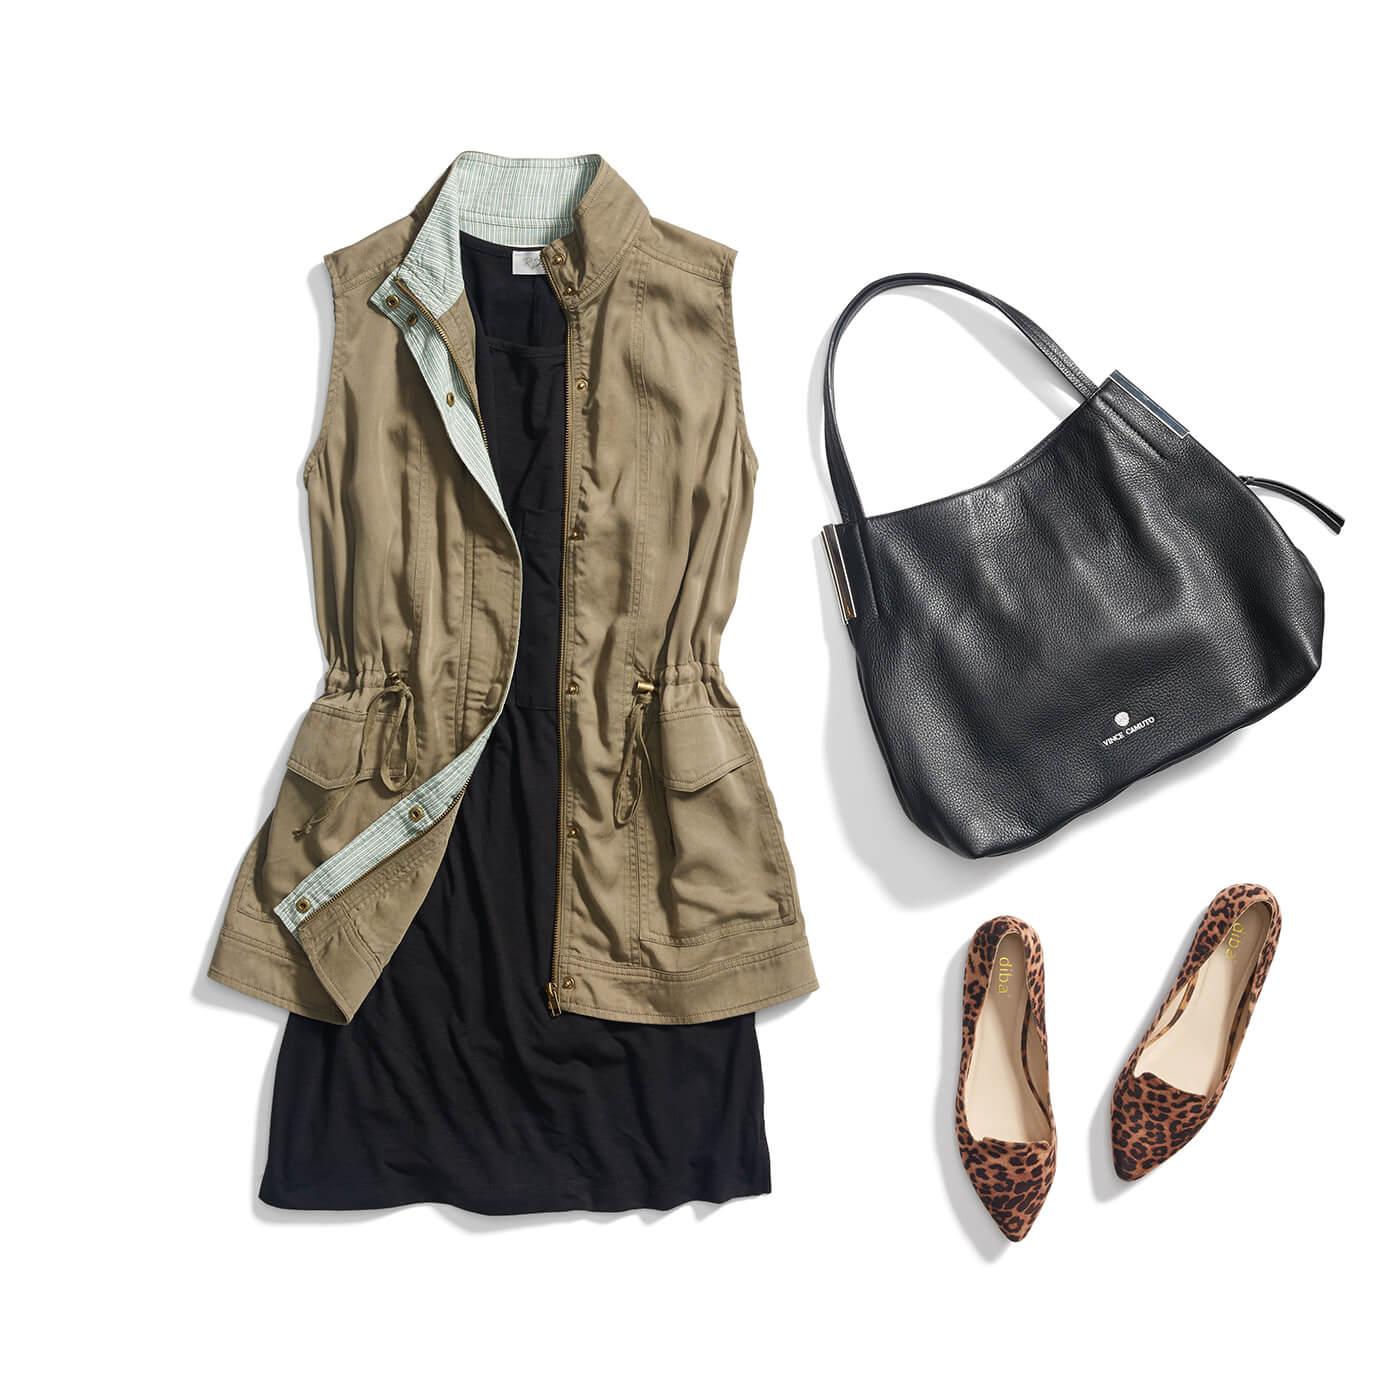 Movie Night Date Outfit Idea